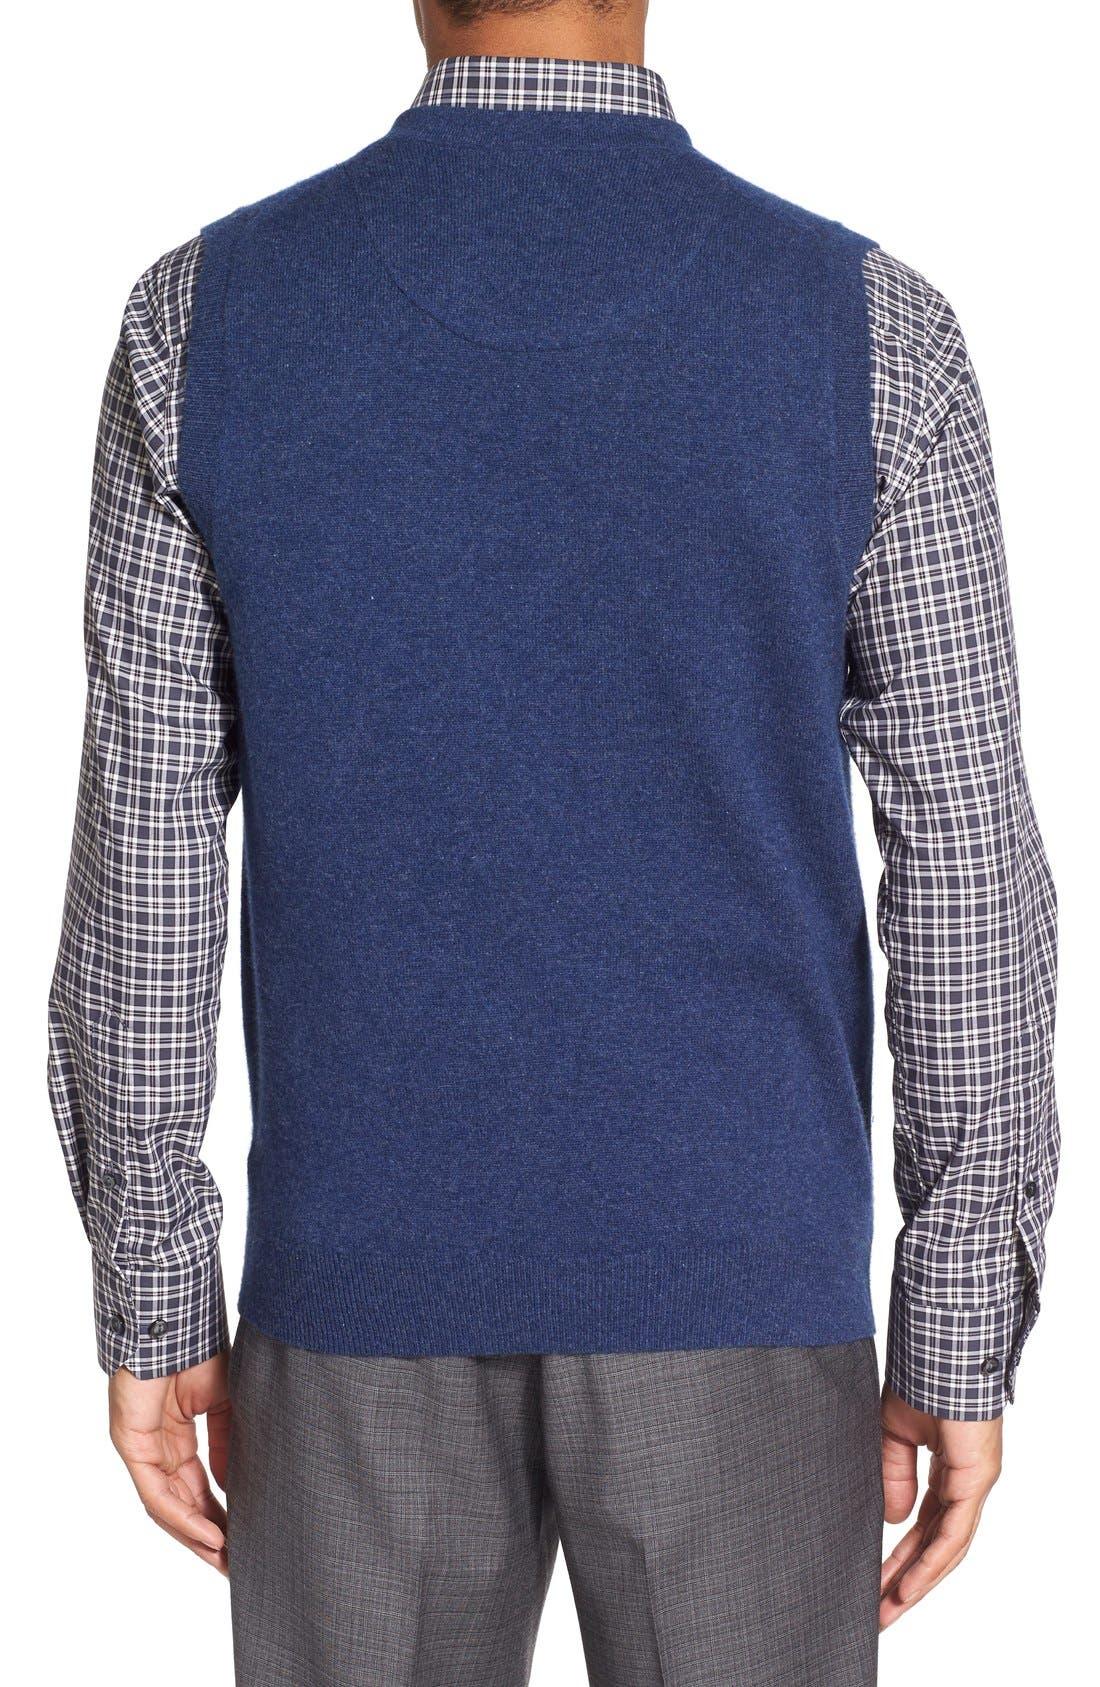 Cashmere V-Neck Sweater Vest,                             Alternate thumbnail 7, color,                             BLUE ESTATE HEATHER